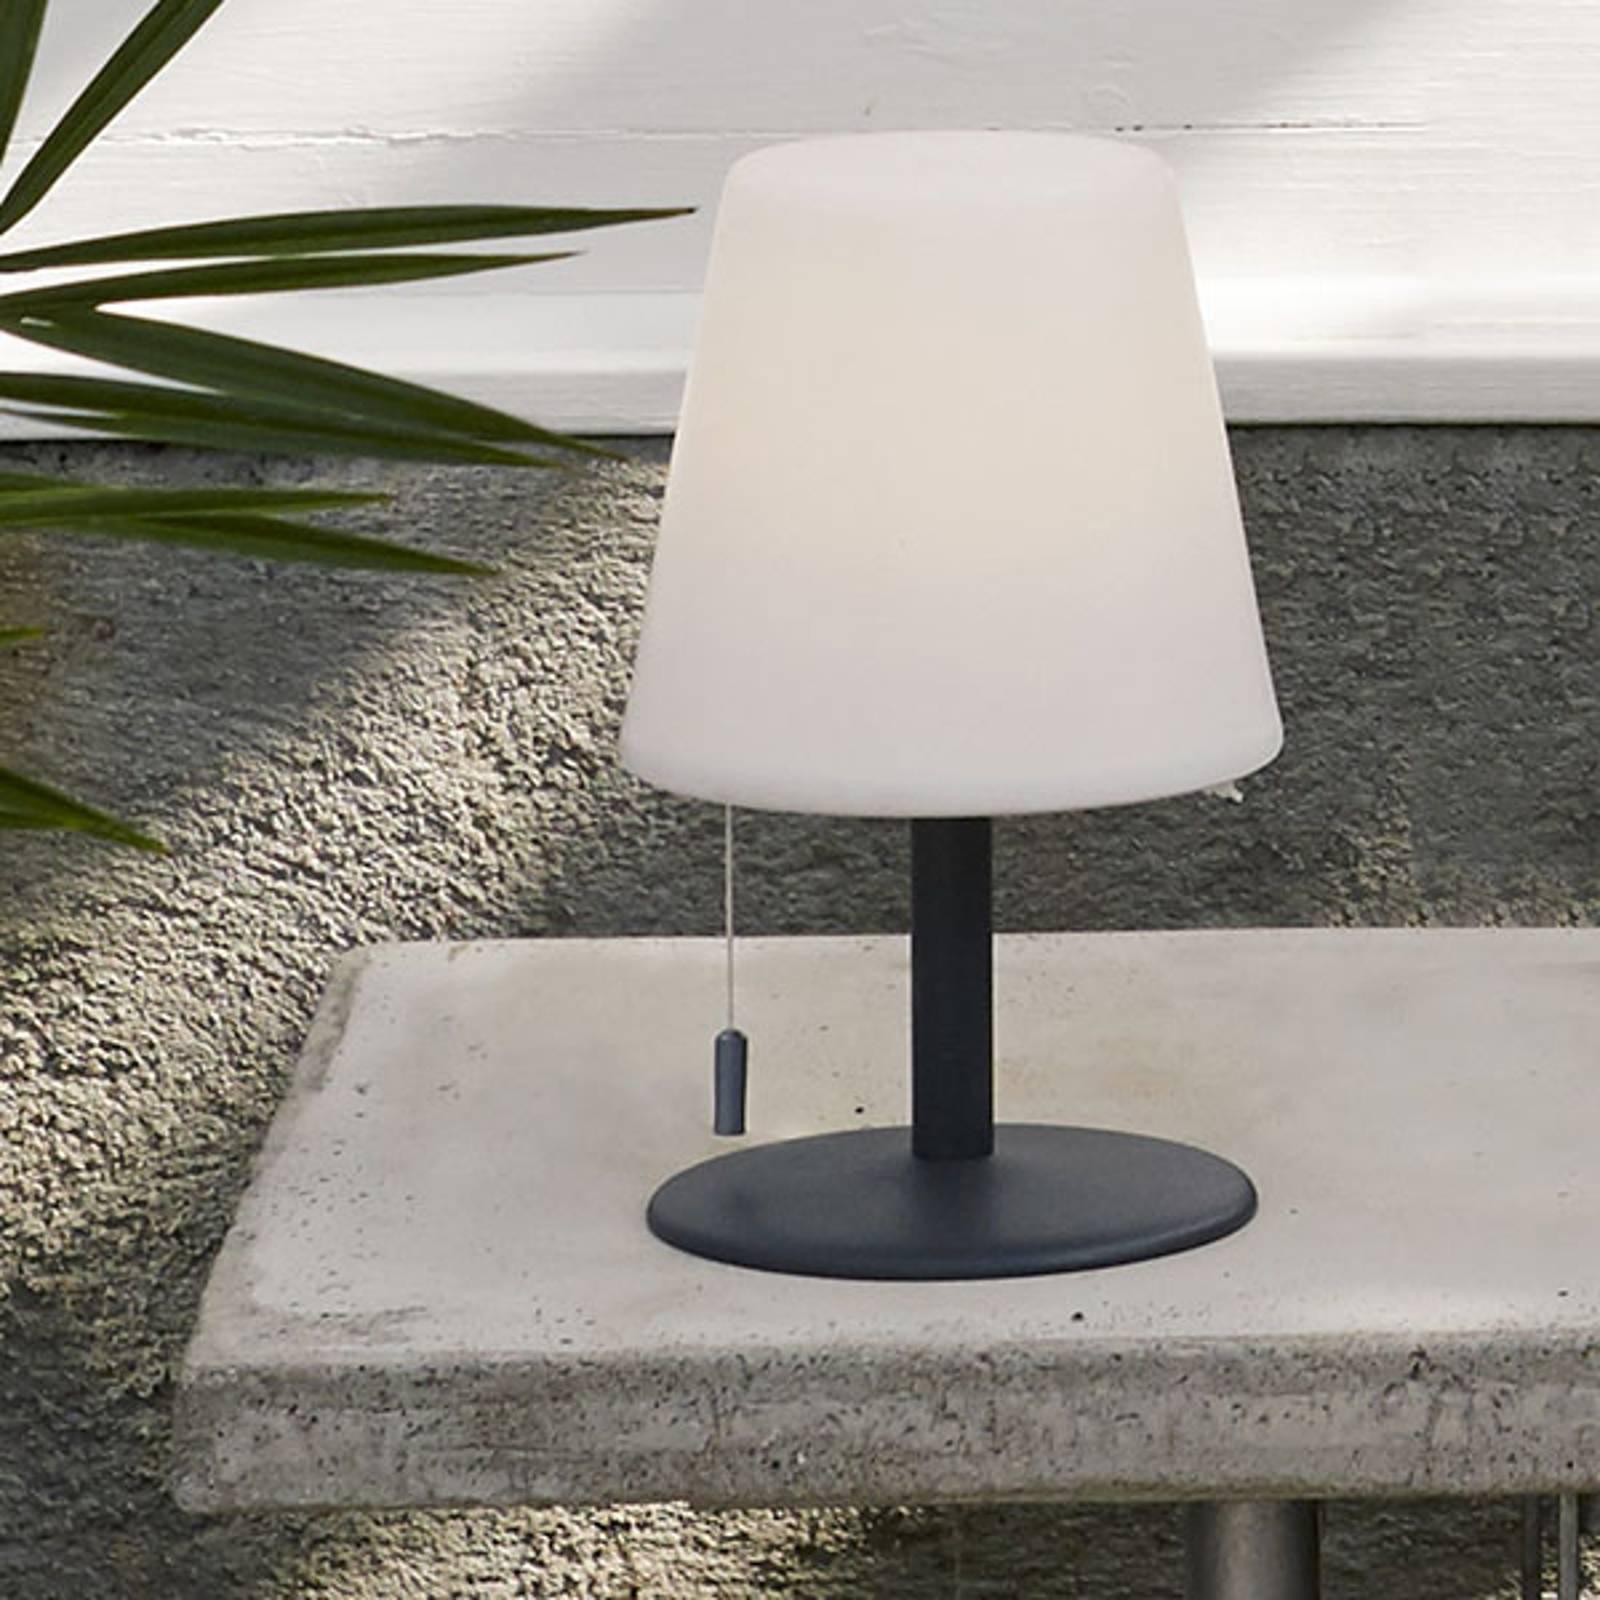 LED tafellamp Gardenlight Kreta met accu 26,5cm